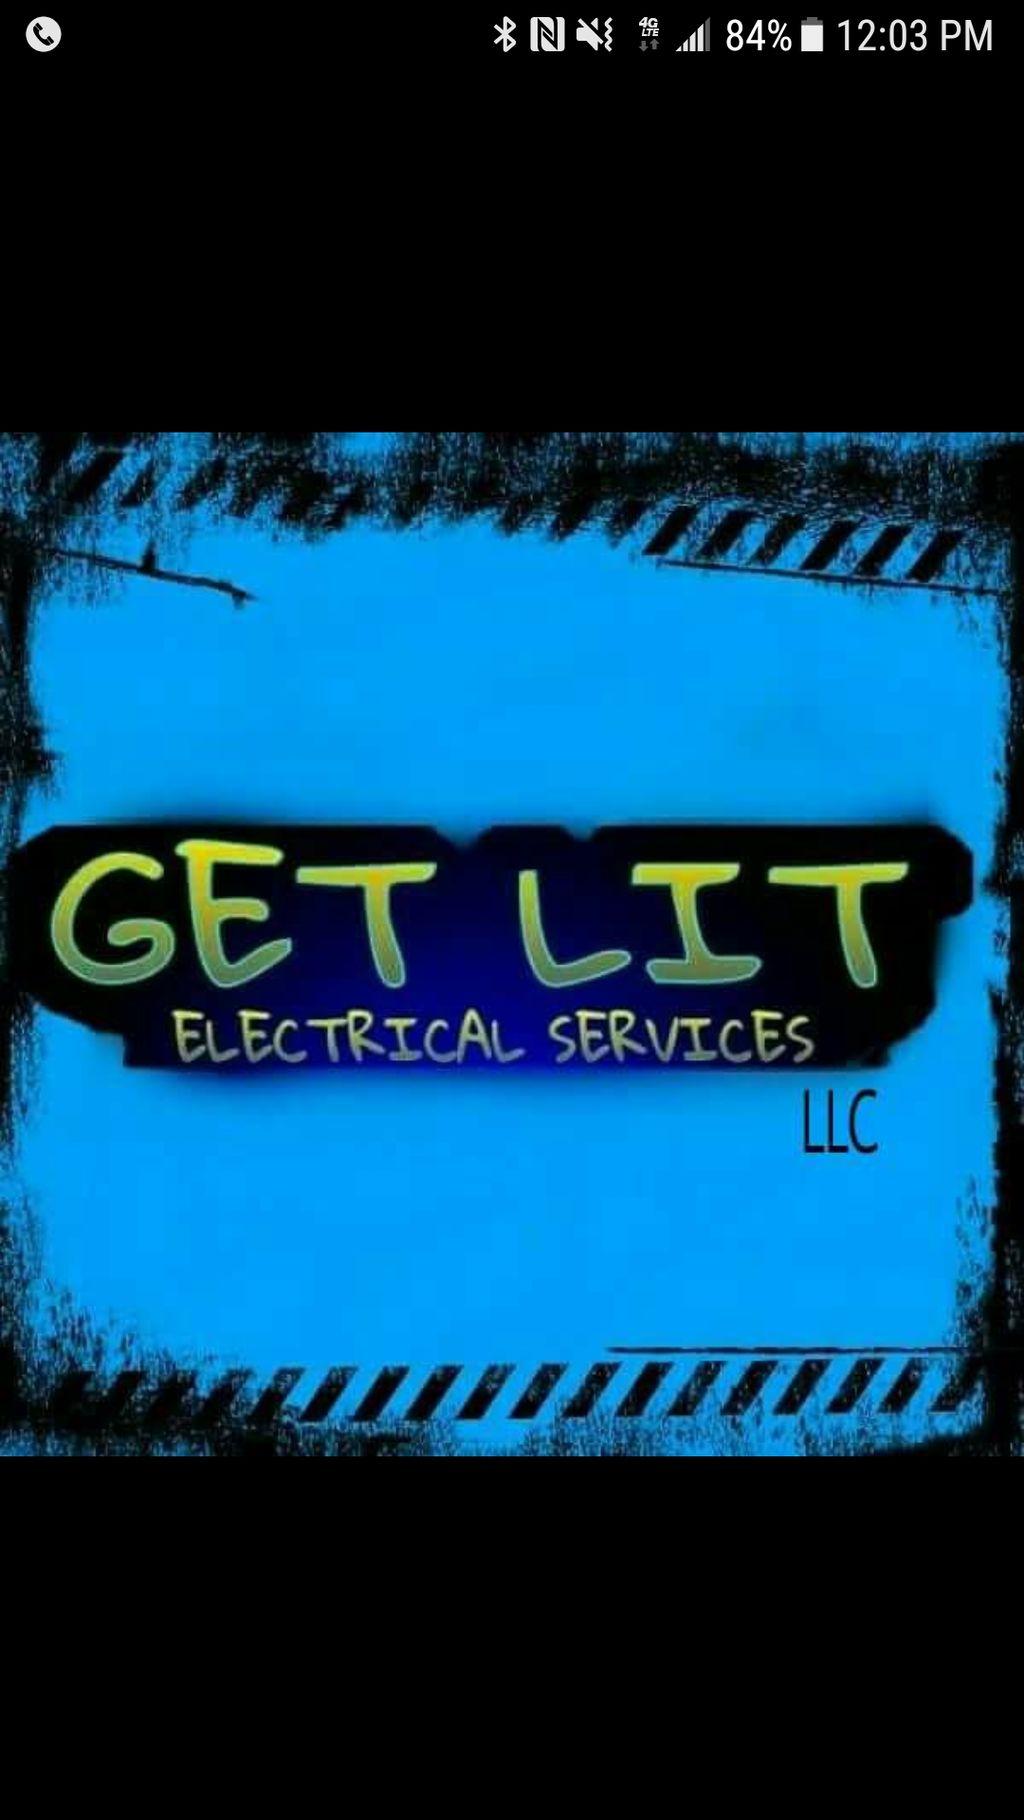 Get Lit Electrical Services LLC